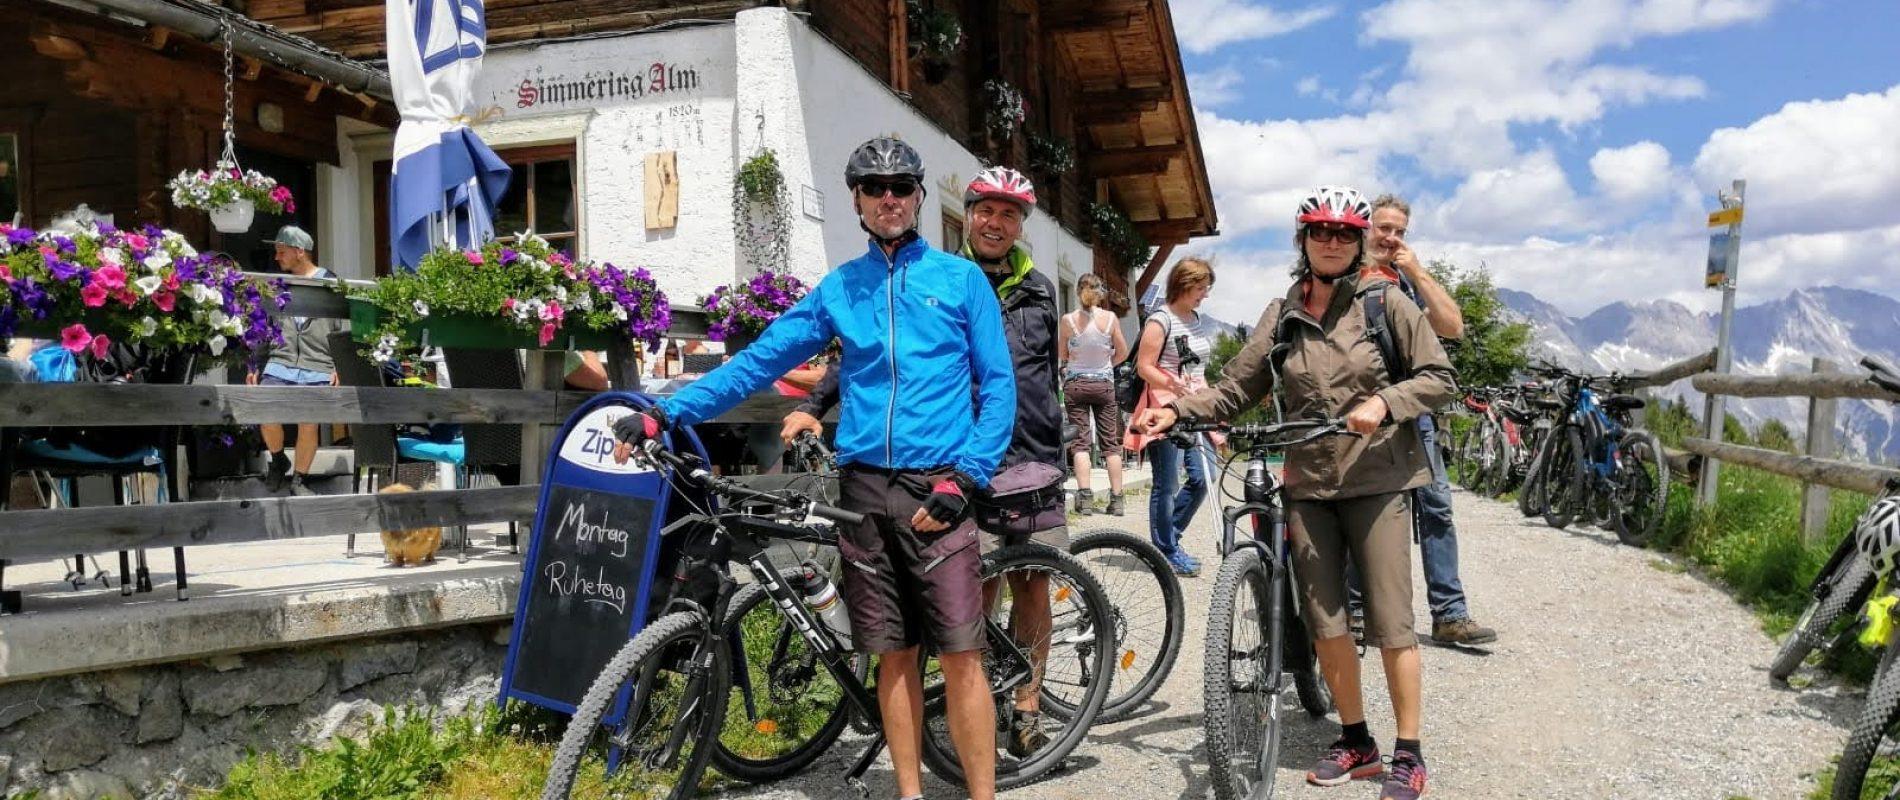 Biketour Simmering